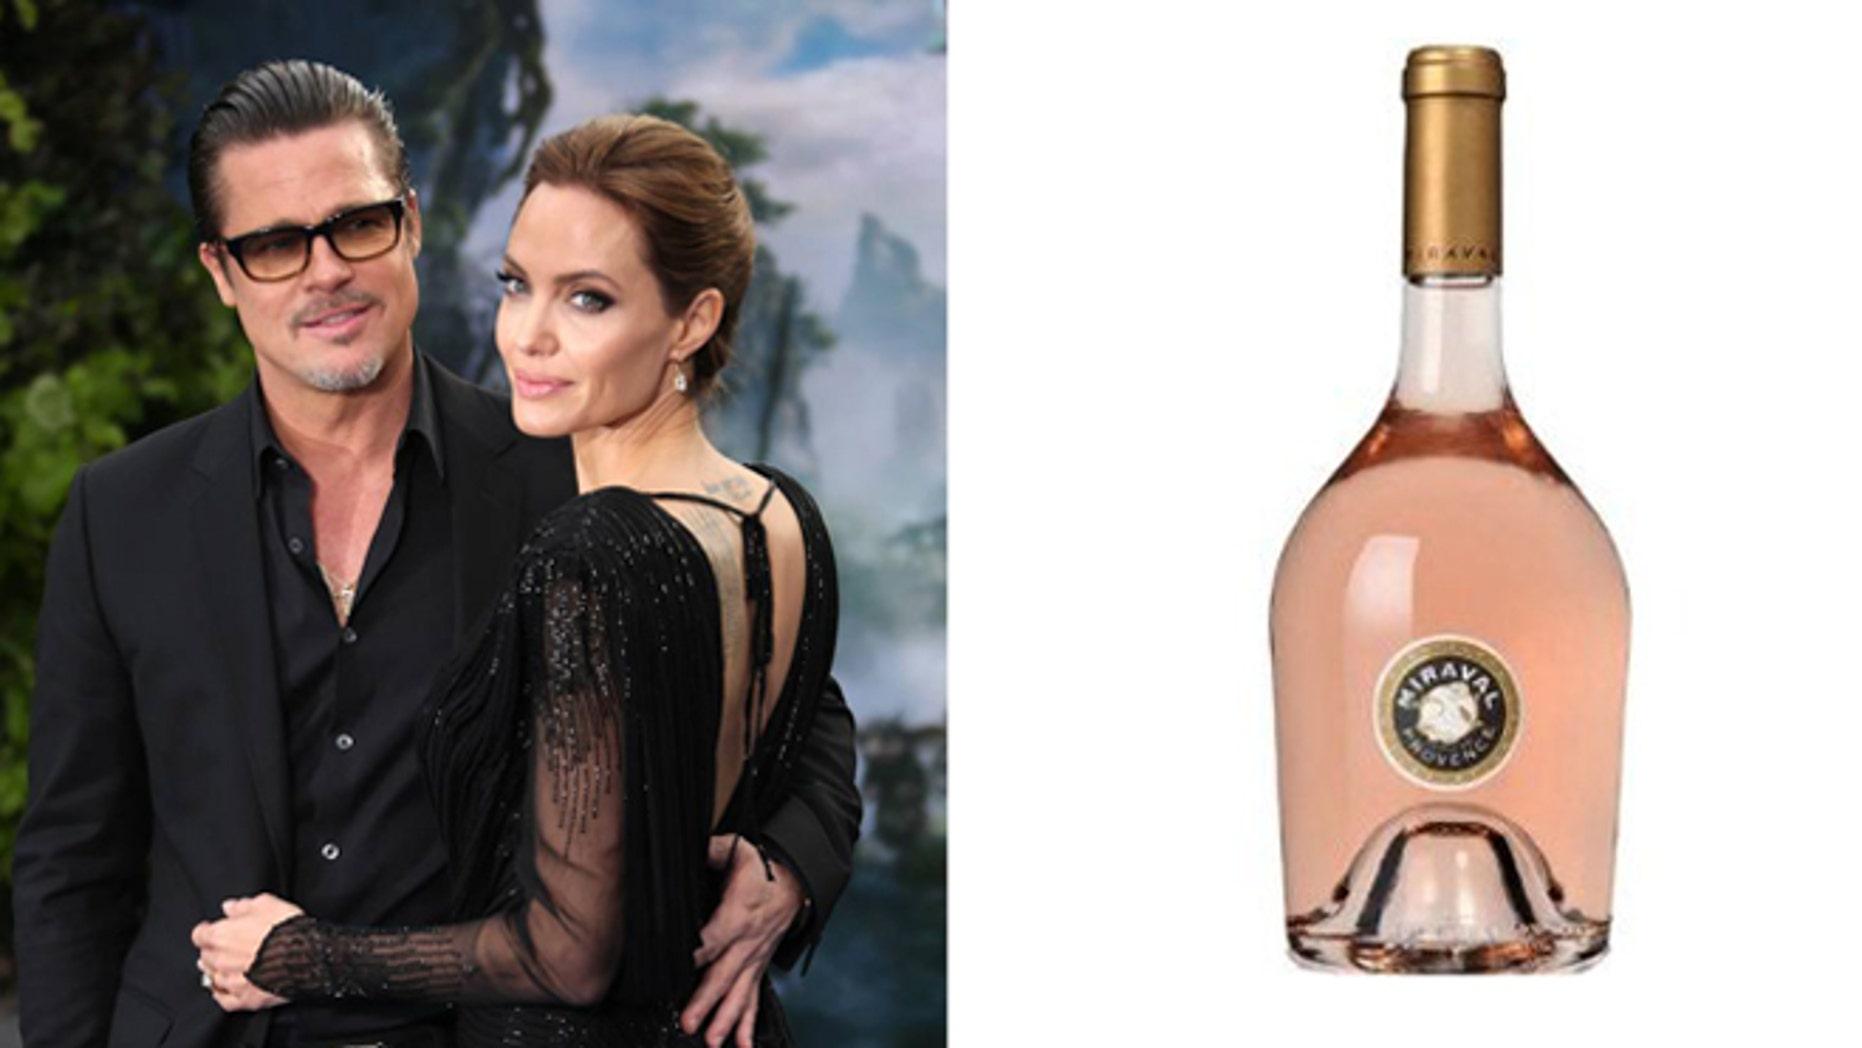 Brangelina's wine is being counterfeiter overseas.